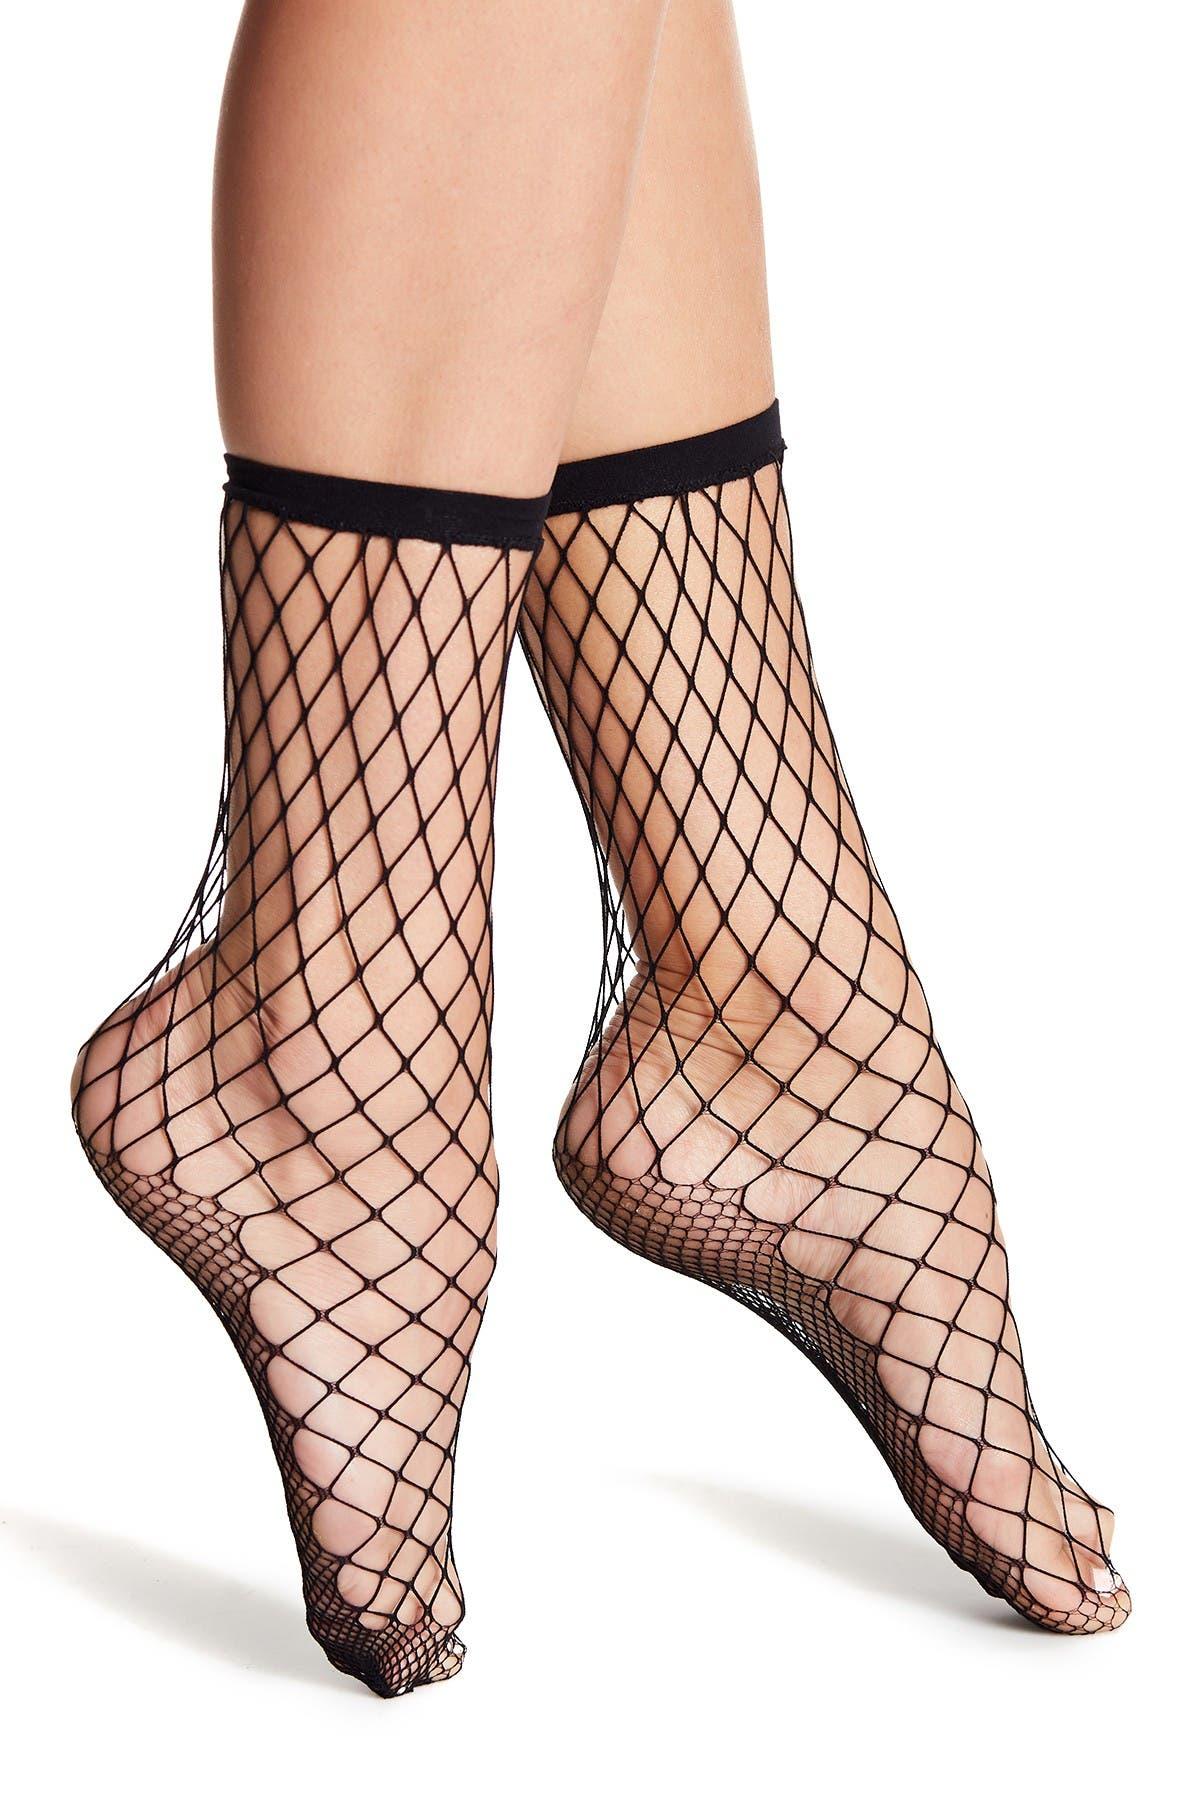 Image of Free People Sugar Sugar Fishnet Socks